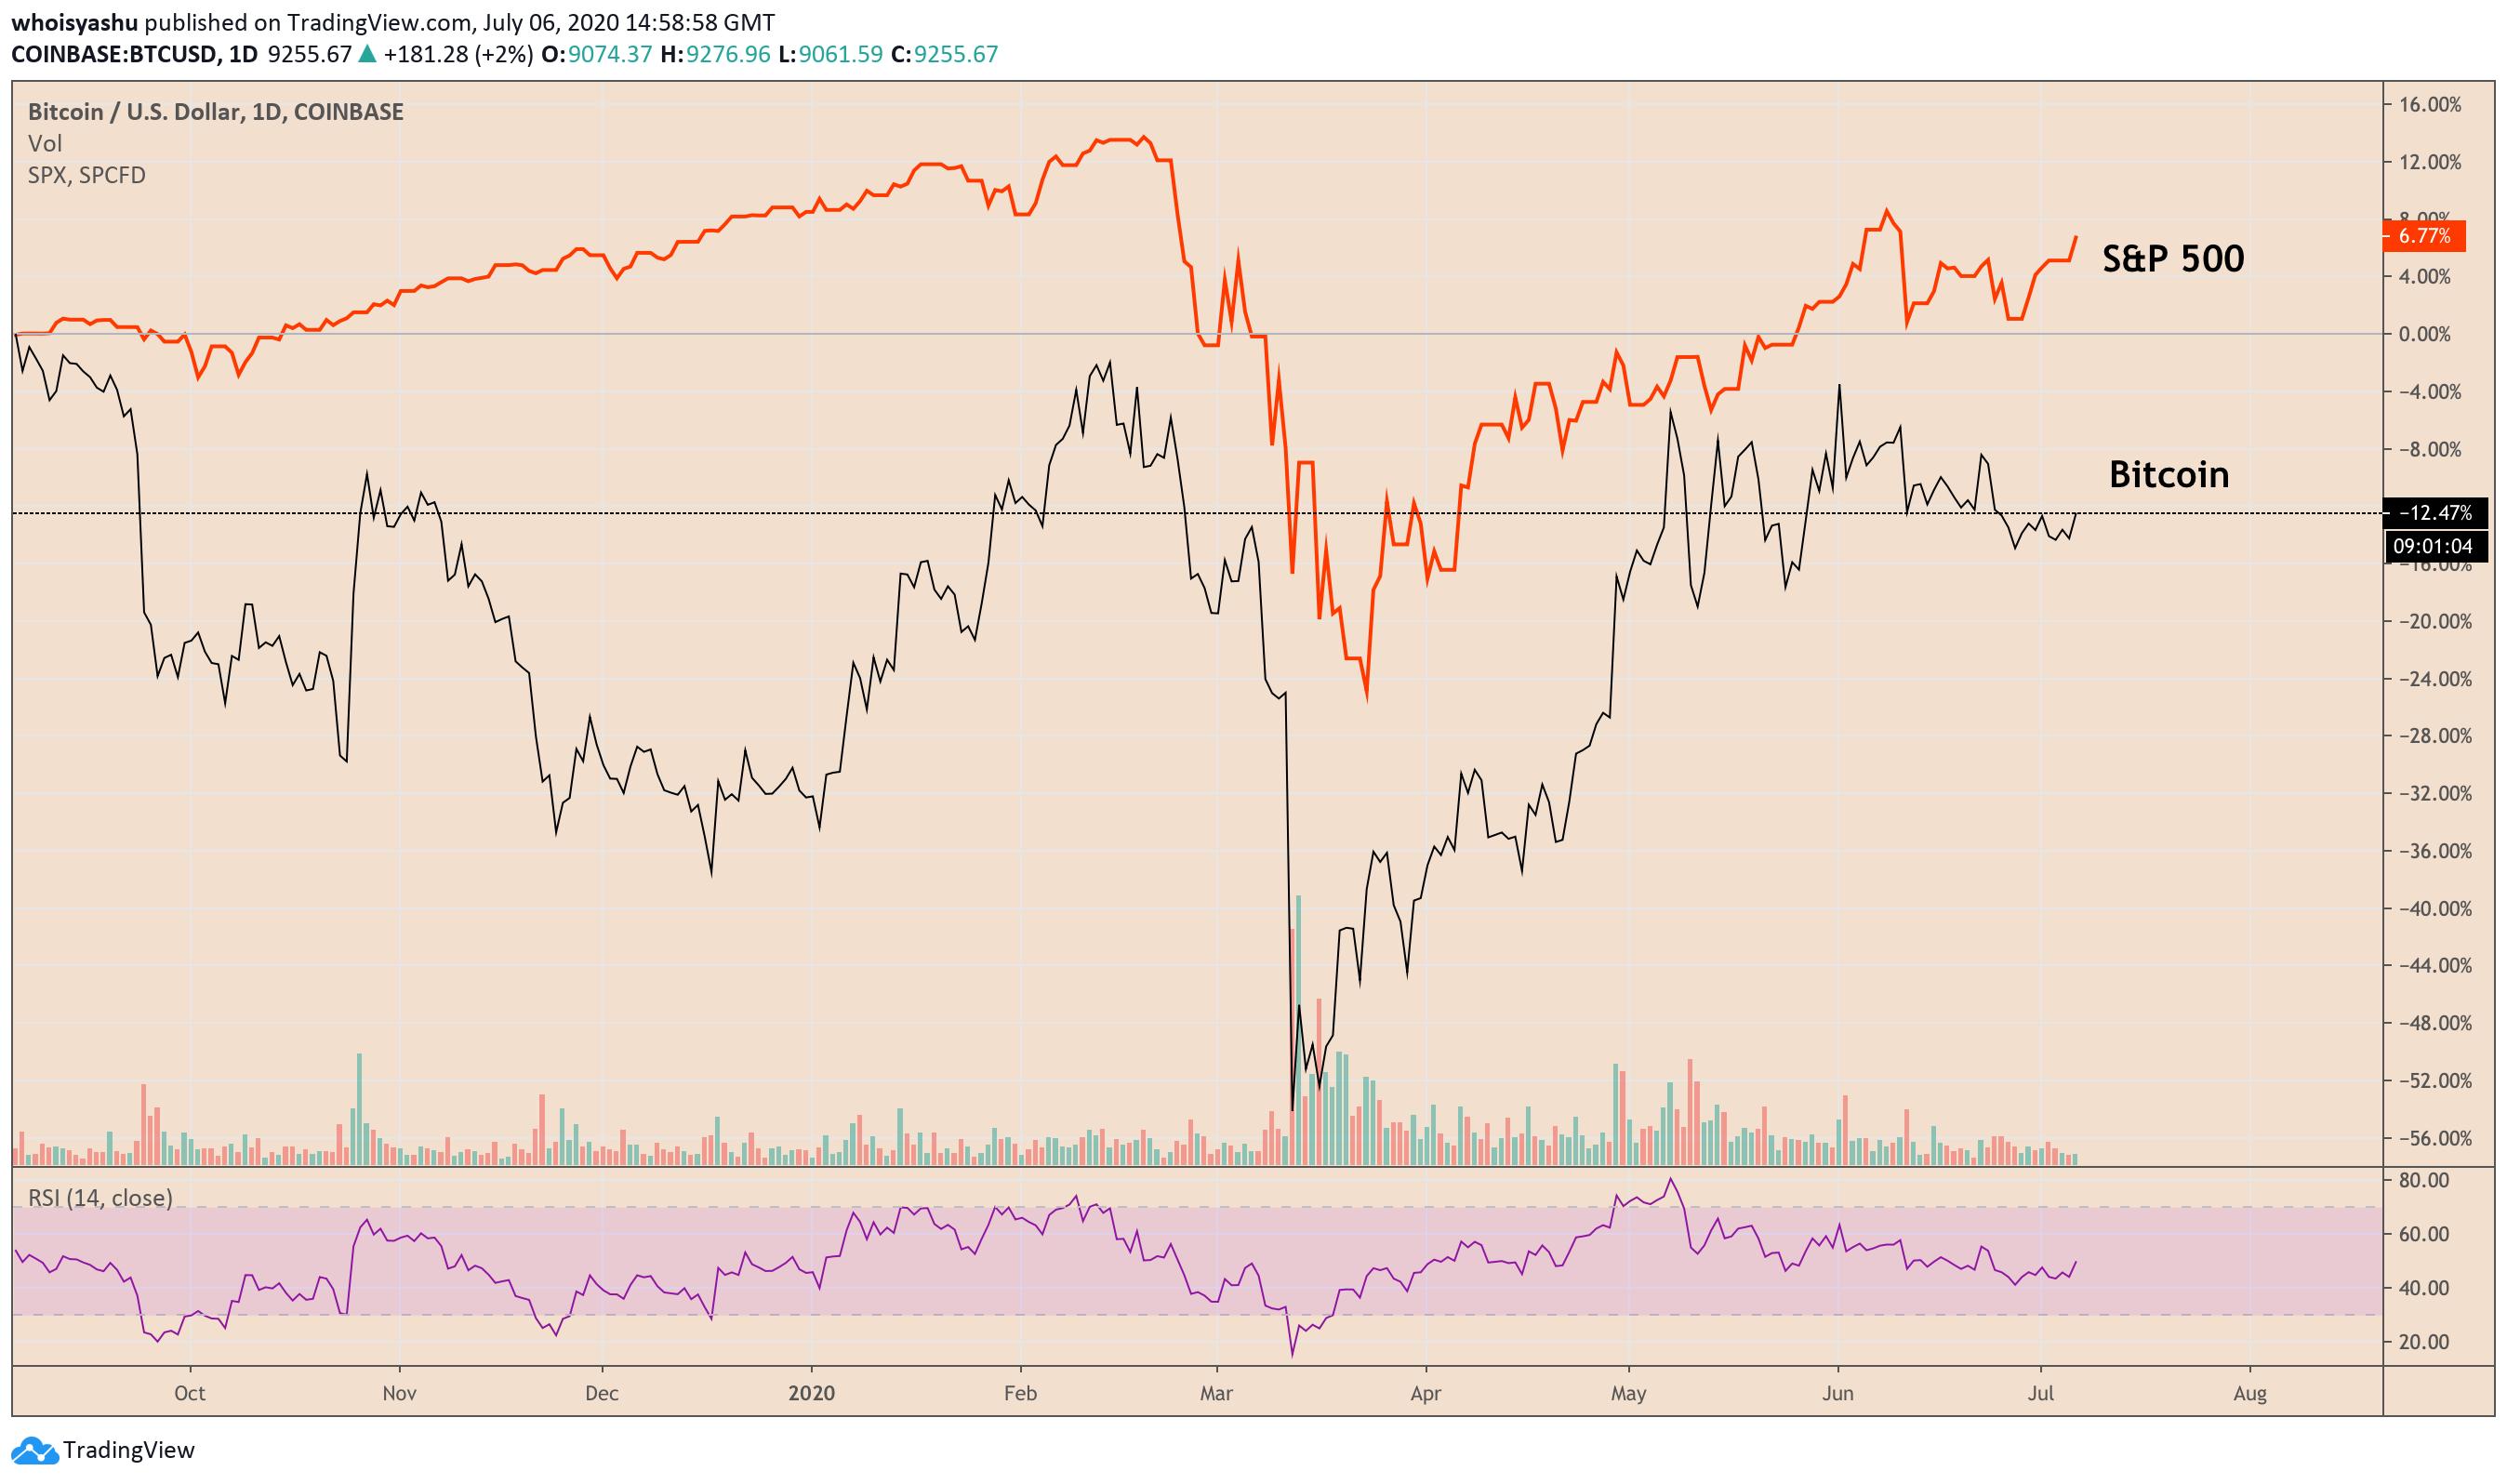 bitcoin, cryptocurrency, btcusd, btcusdt, xbtusd, crypto, S&P 500, SPX